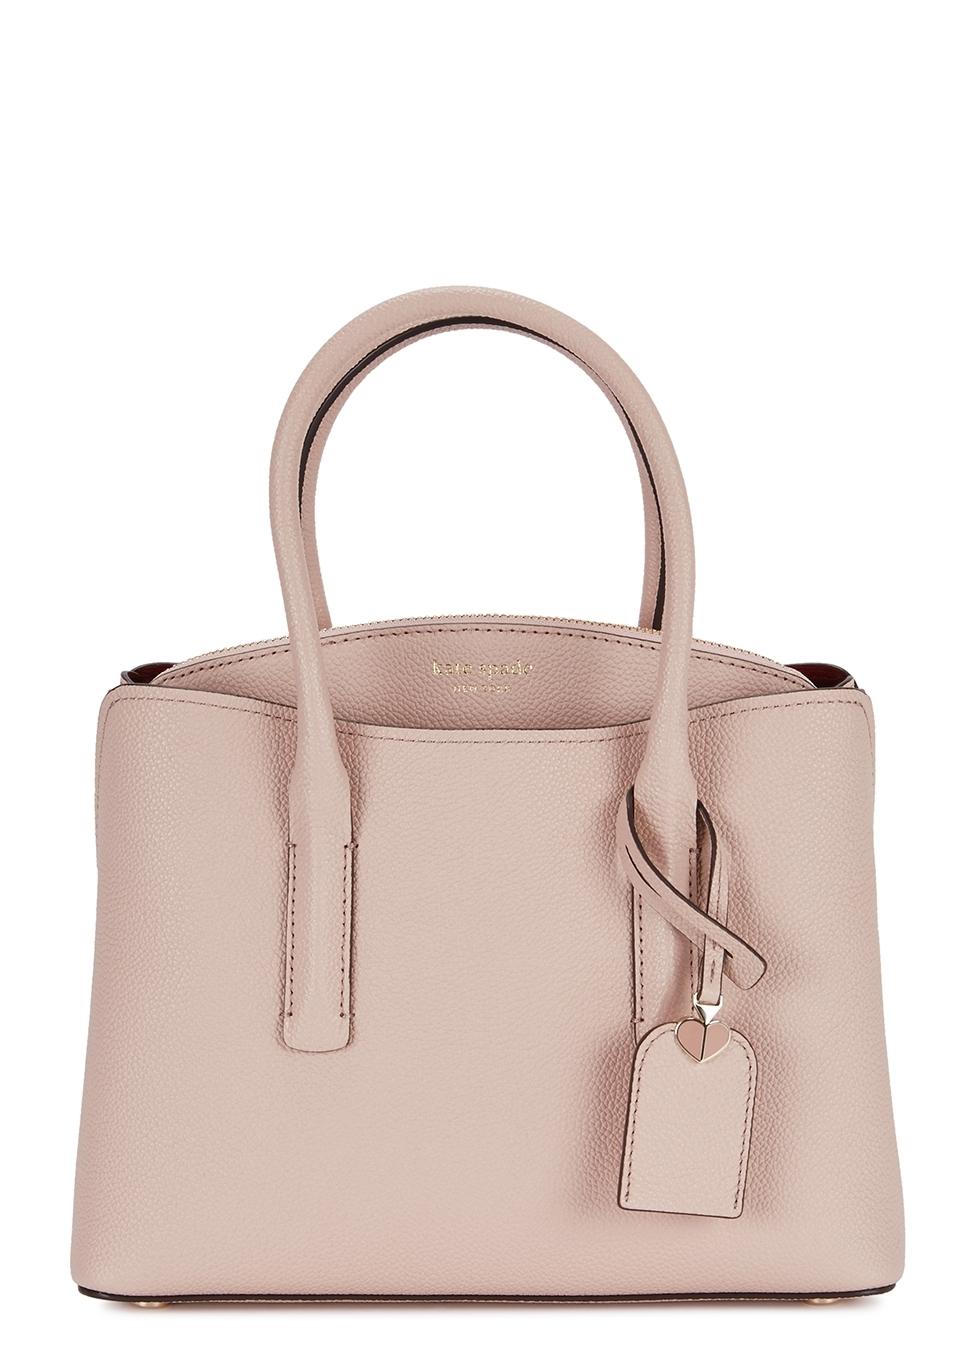 f918cb79efe2 Women s Designer Cross-Body Bags - Harvey Nichols